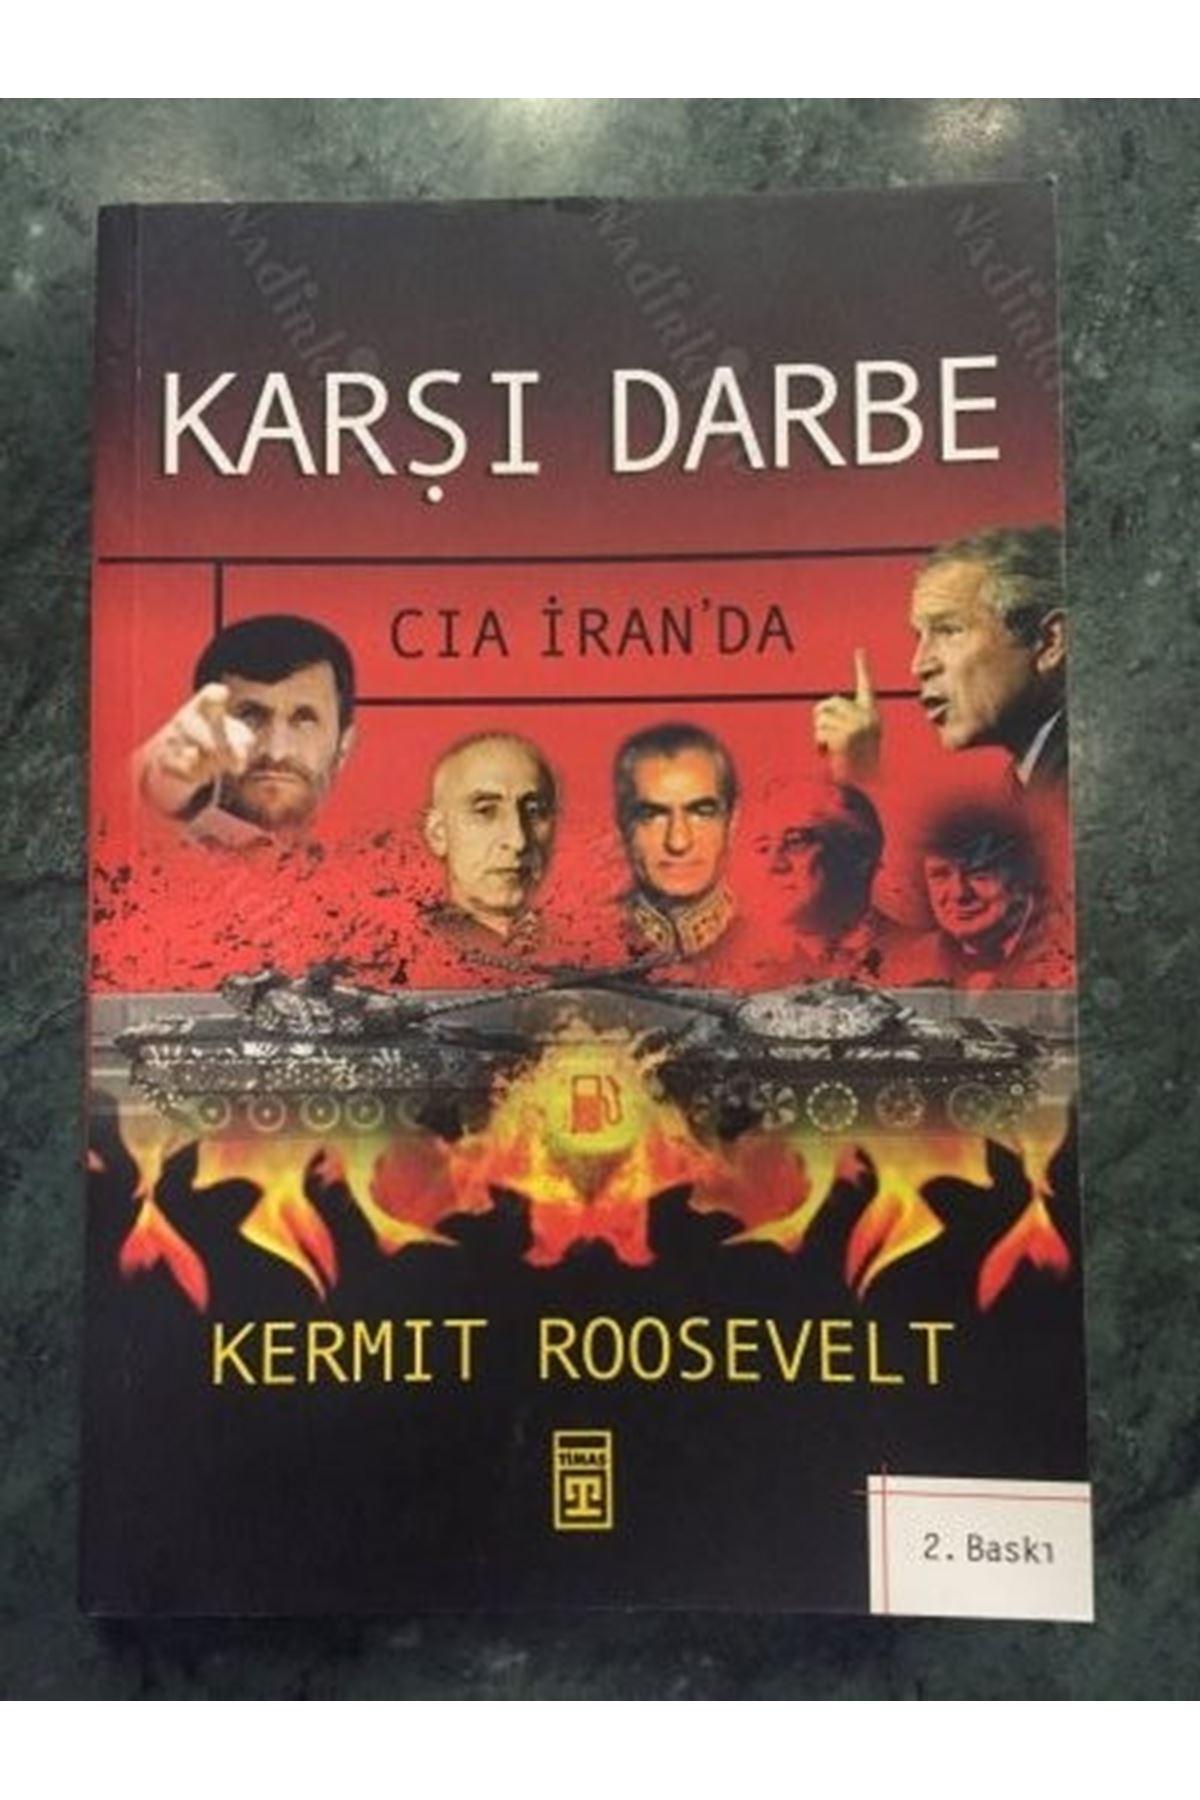 KERMIT ROOSEVELT - KARŞI DARBE CIA İRAN'DA